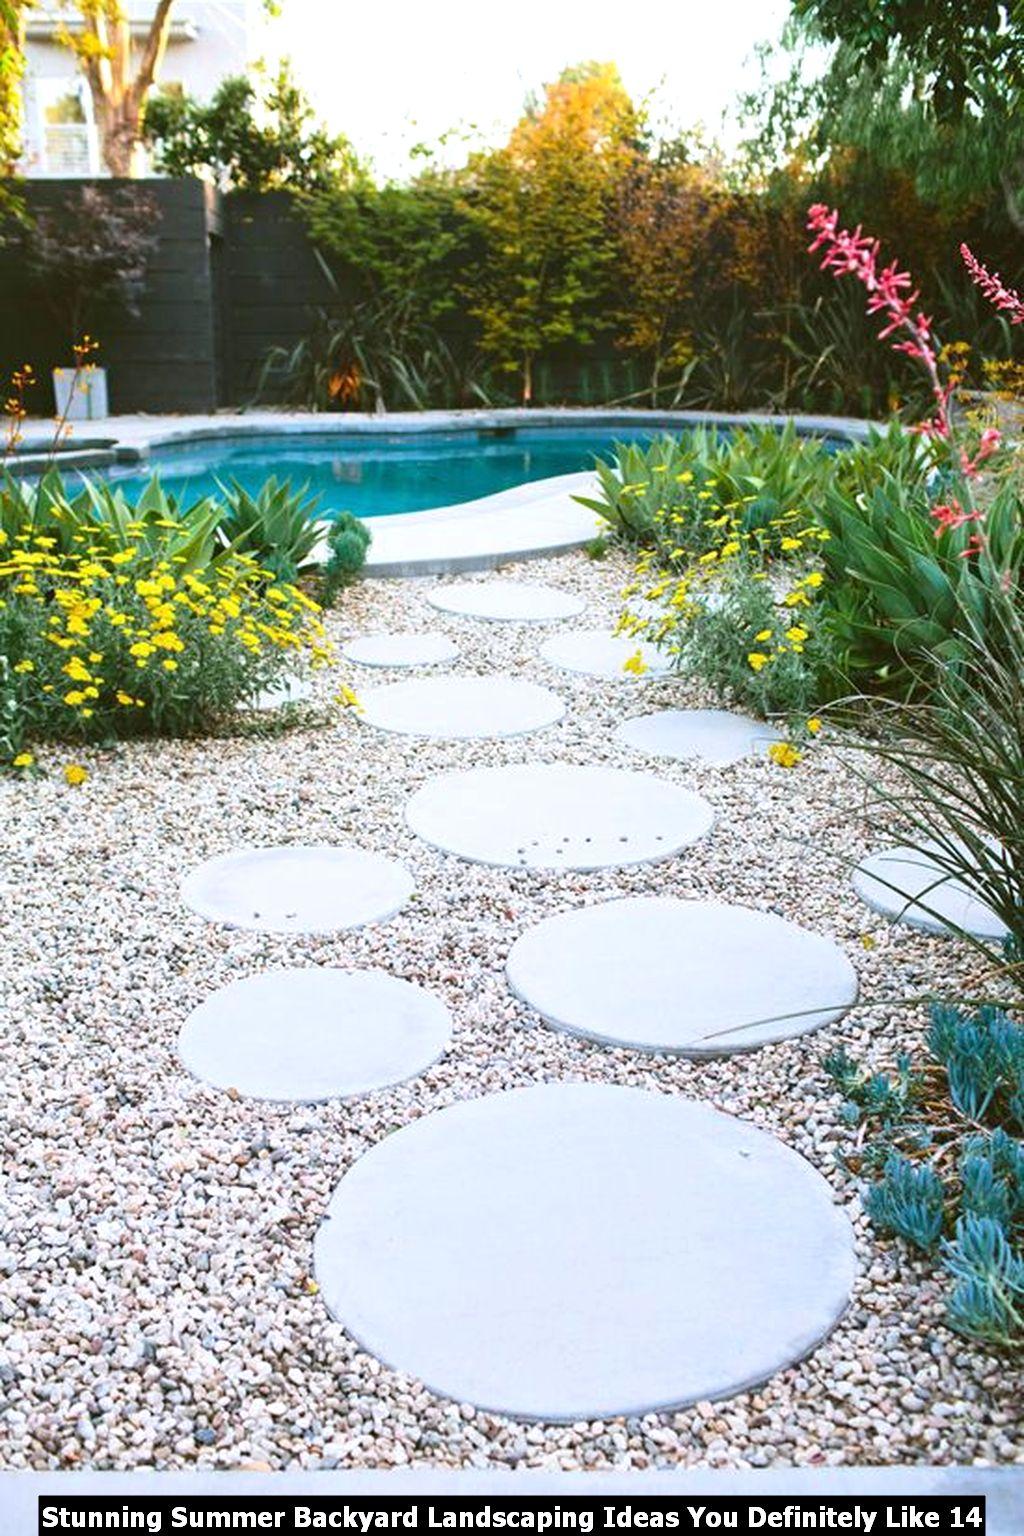 Stunning Summer Backyard Landscaping Ideas You Definitely Like 14